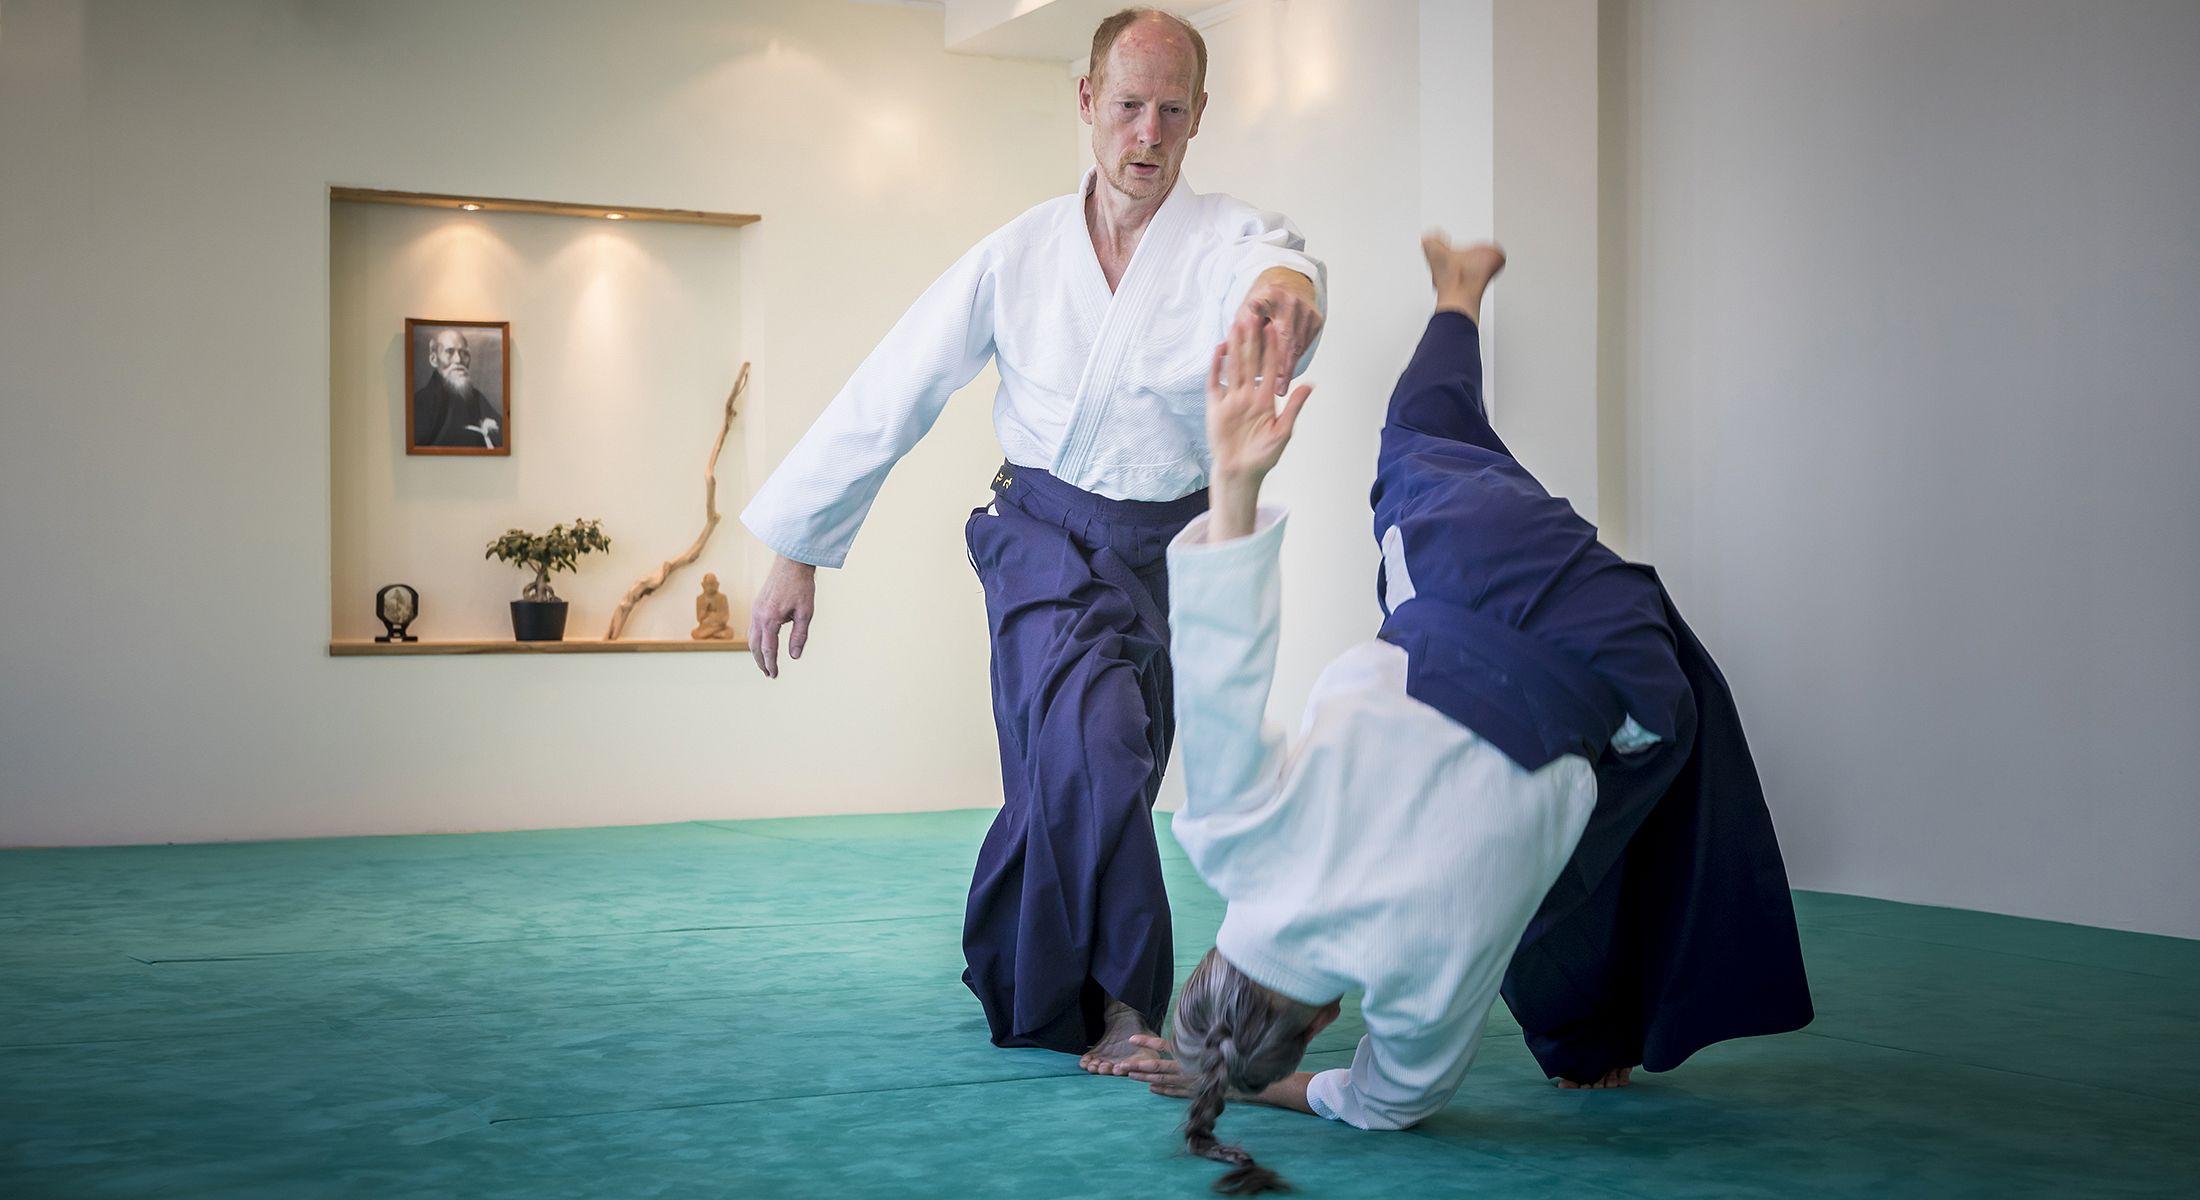 http://www.aikido-schule-bielefeld.de/wp-content/uploads/2018/12/slider06_1.jpg